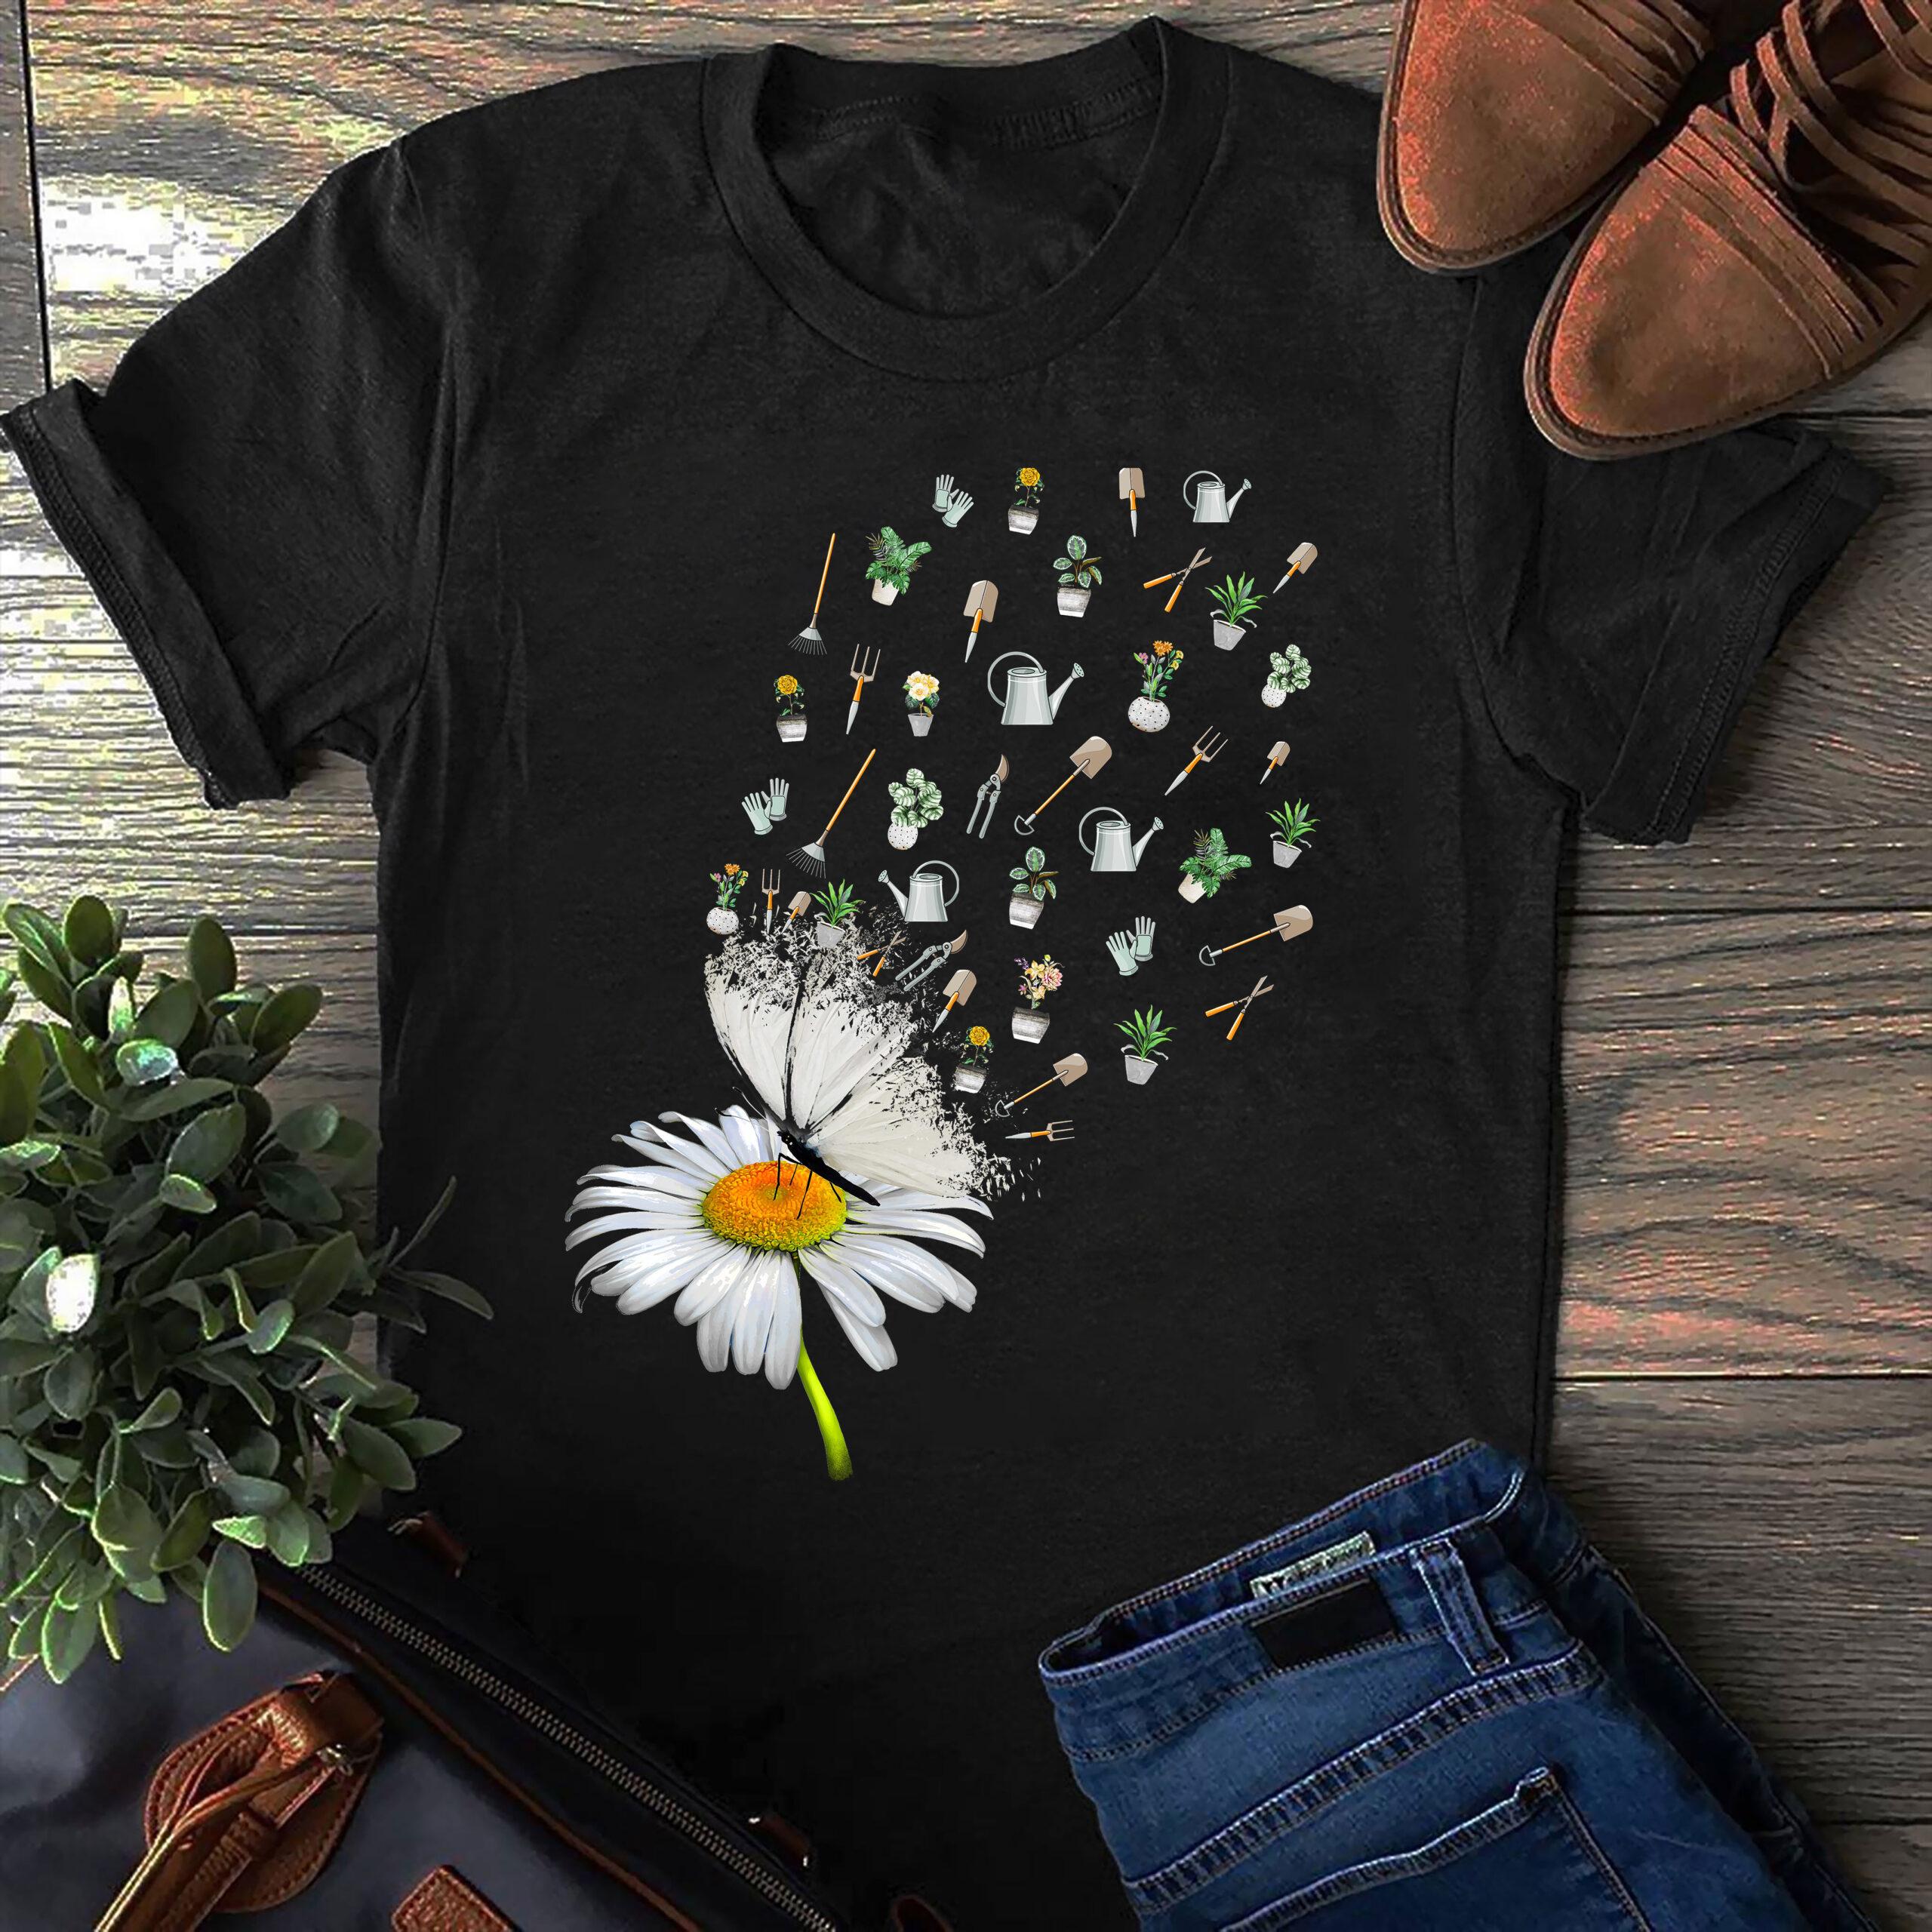 Gardening Shirt Sunflower Gardening Tools Fly